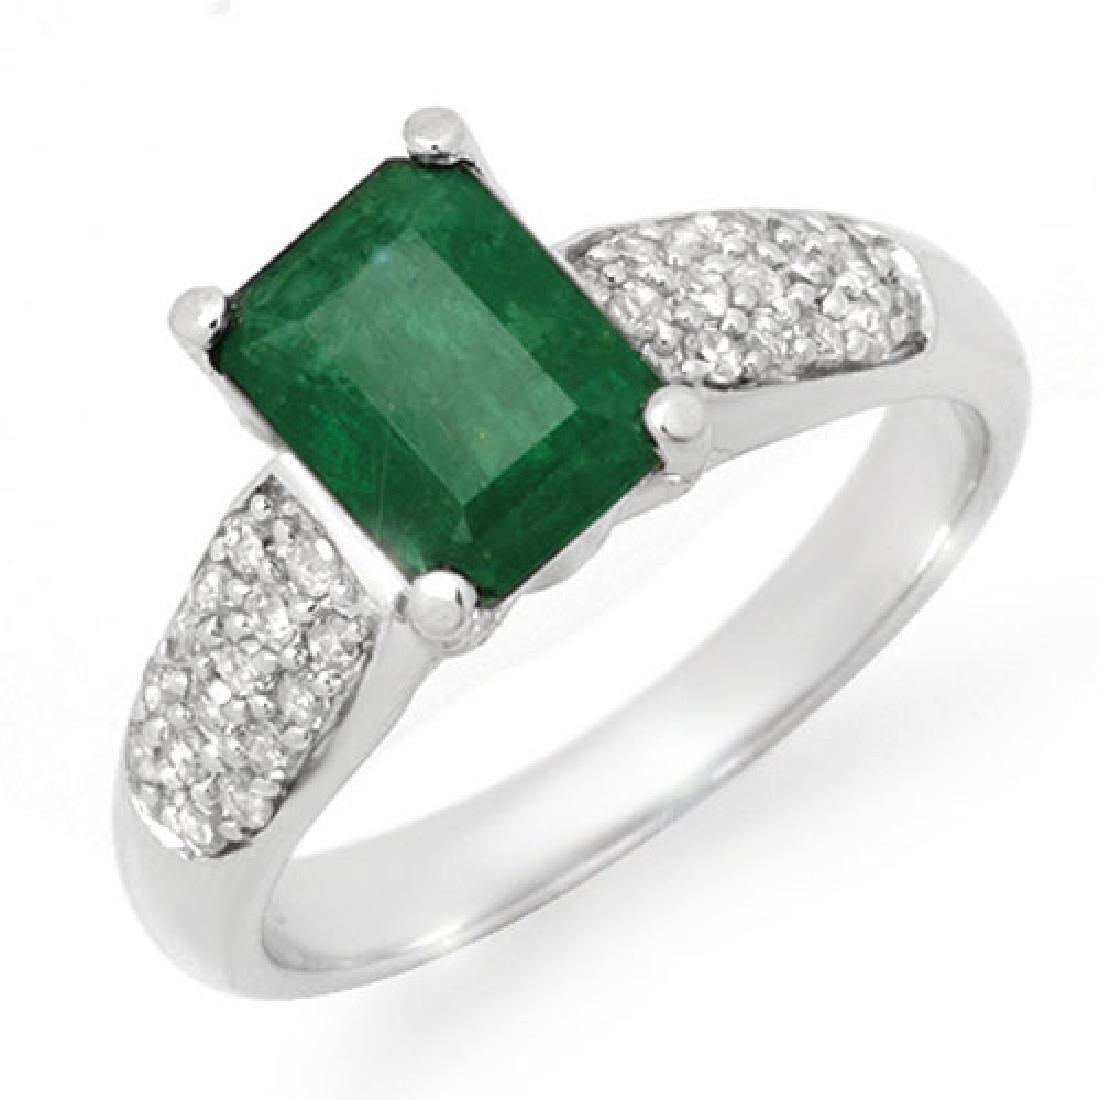 1.76 CTW Emerald & Diamond Ring 10K White Gold